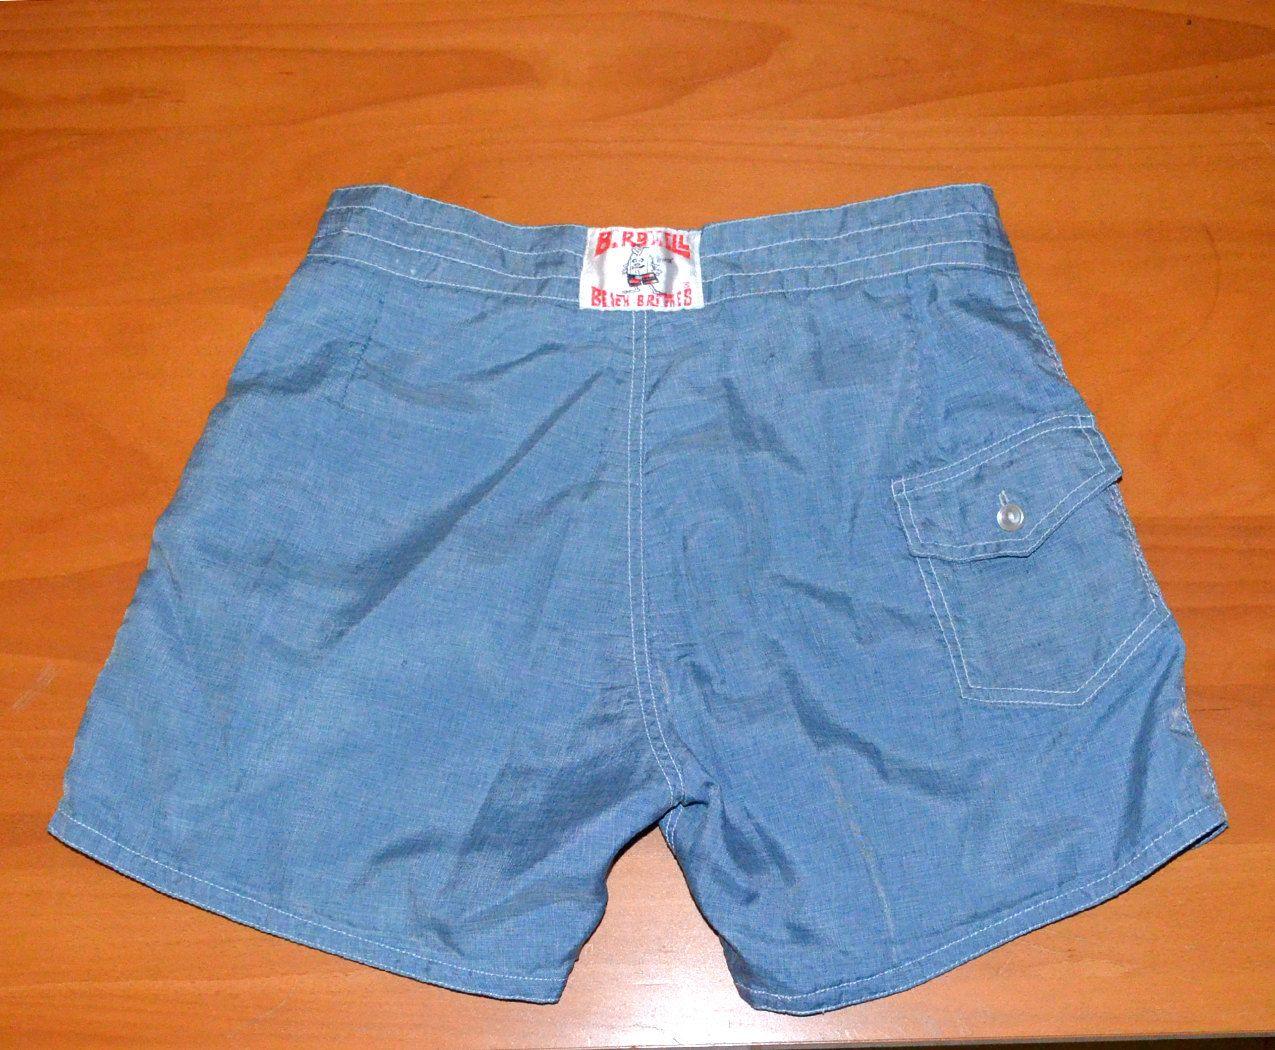 c8b7617604 vintage 70s board shorts BIRDWELL beach britches bathing suit swim trunks  surf Small Medium 31 waist 80s. $22.00, via Etsy.